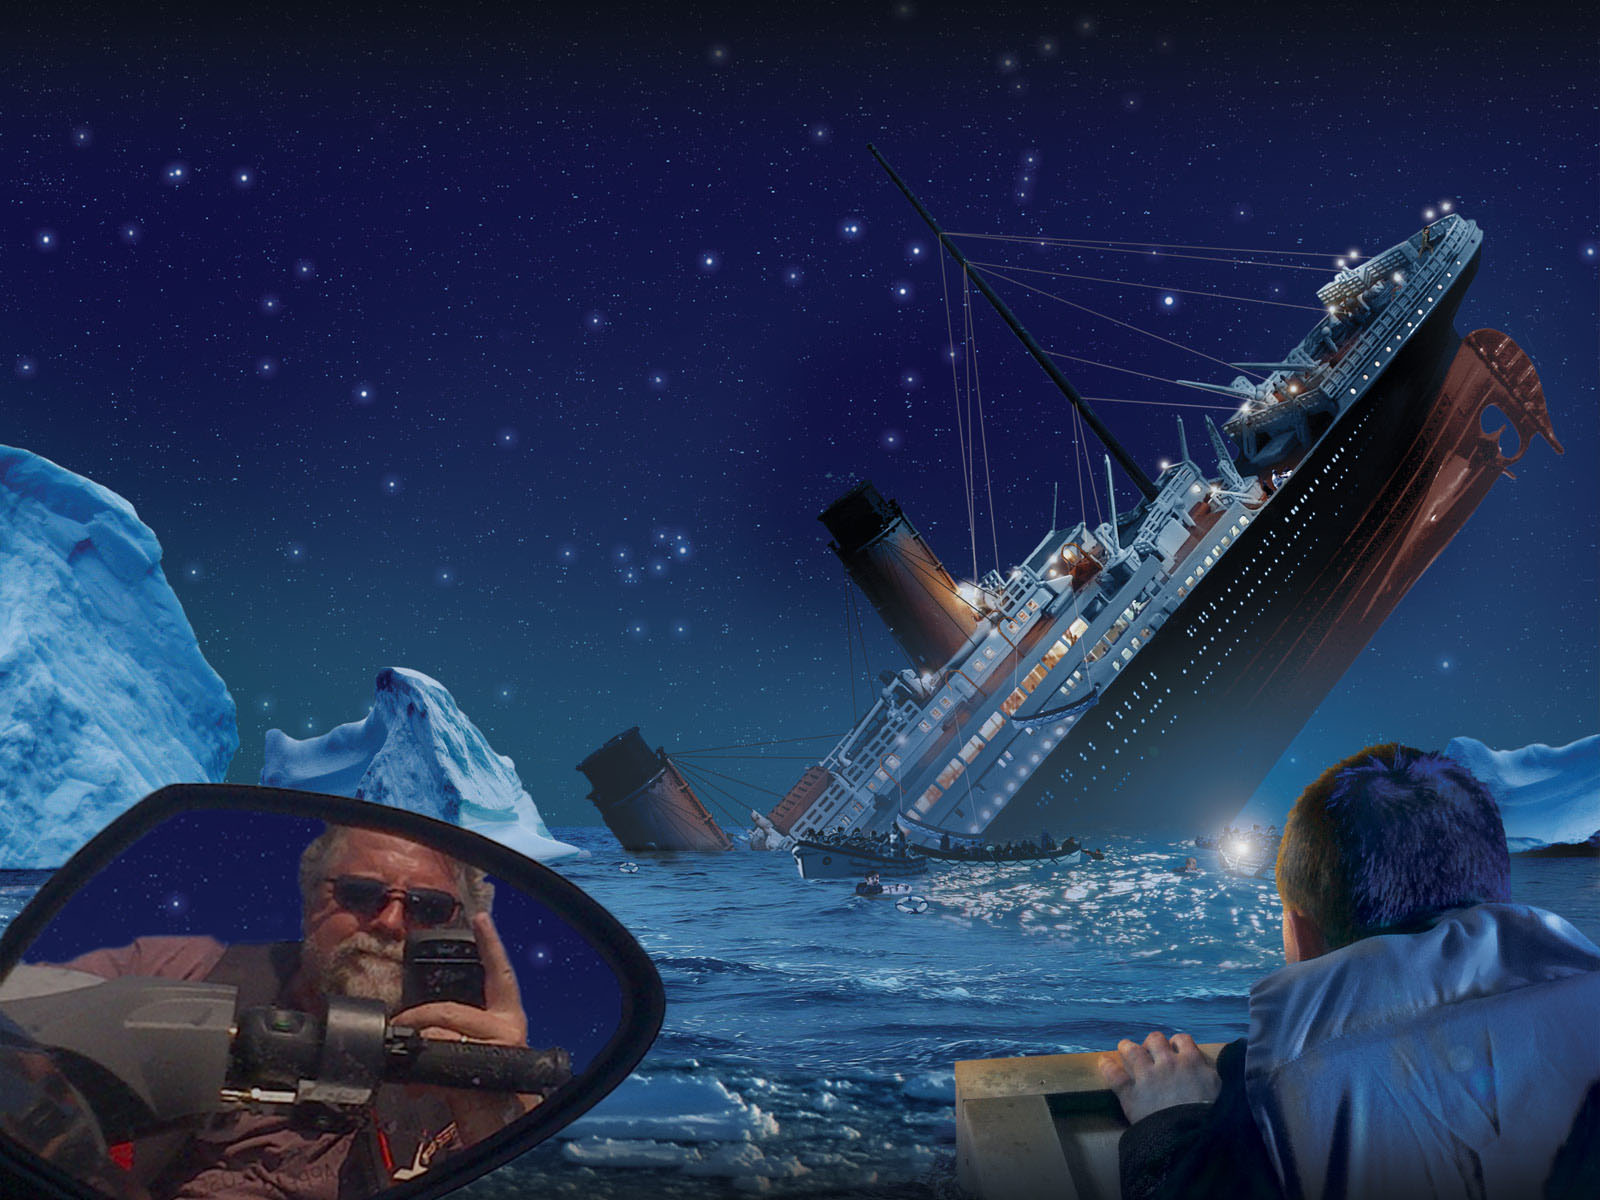 Skip - RMS Titanic (1912)